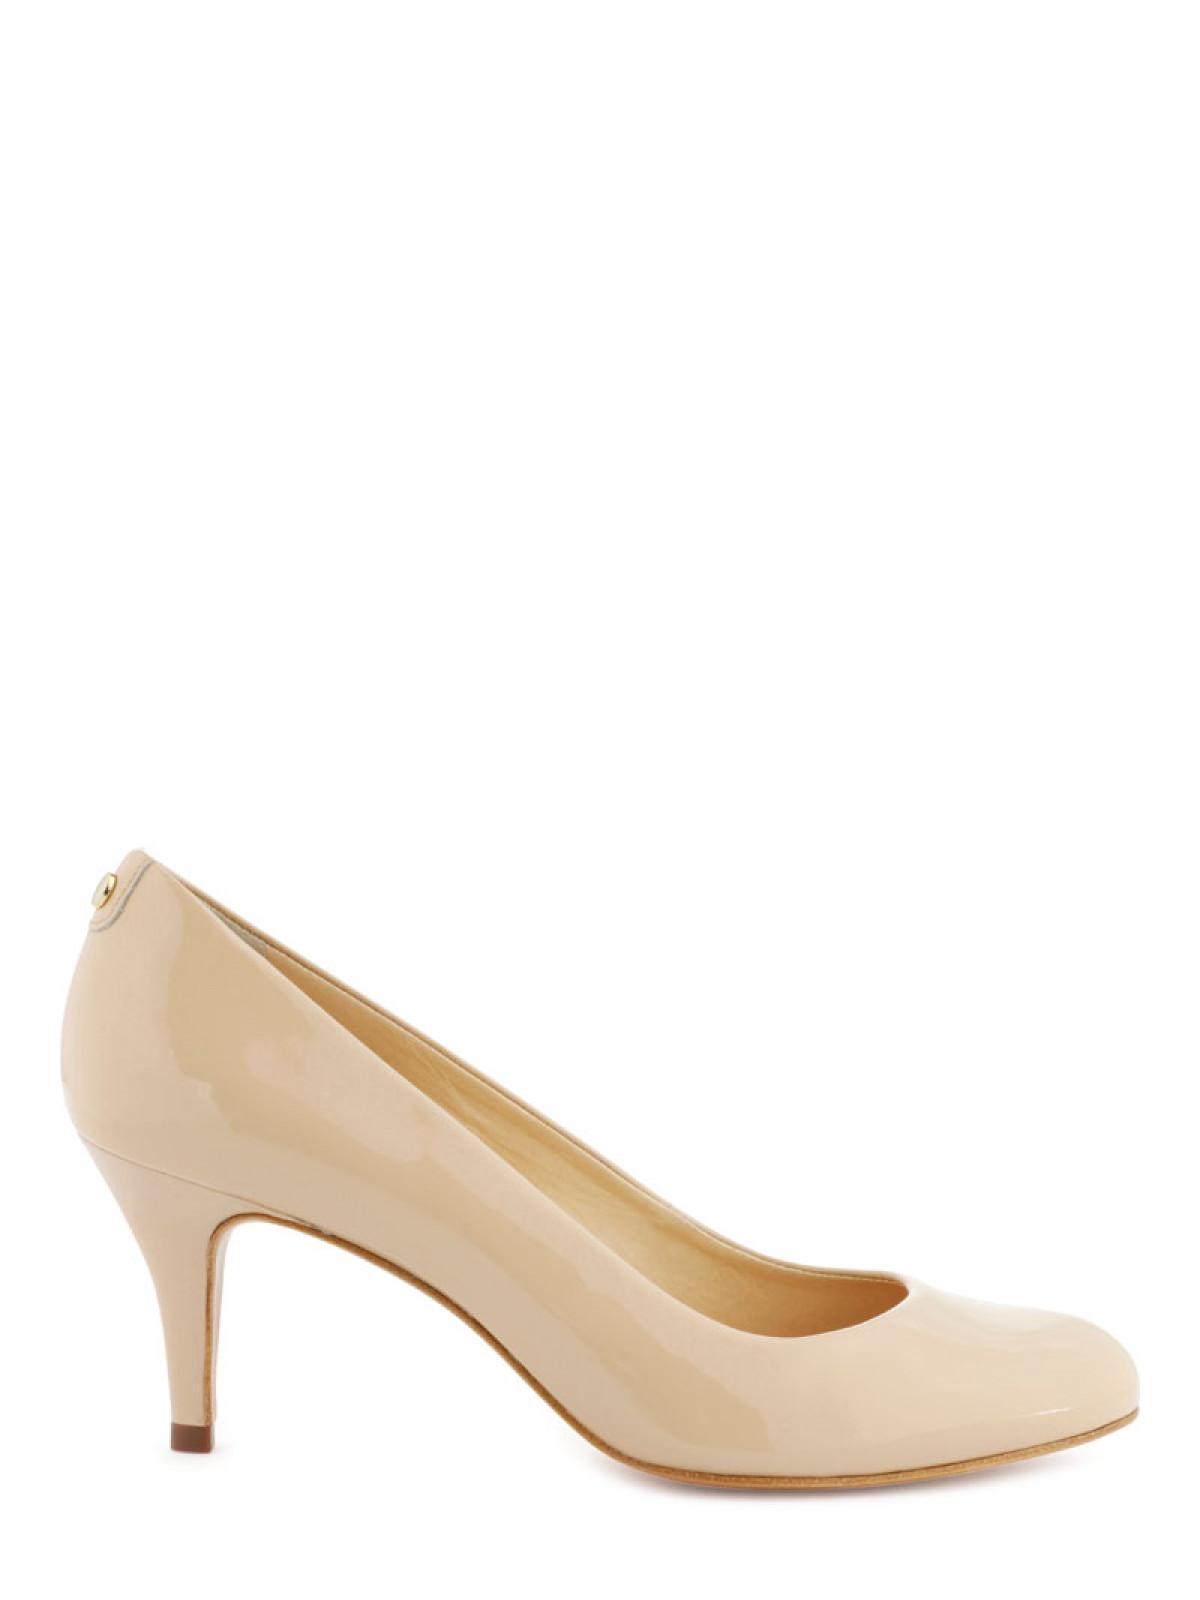 2. escarpins-vernis-nude-chaussures-mariee